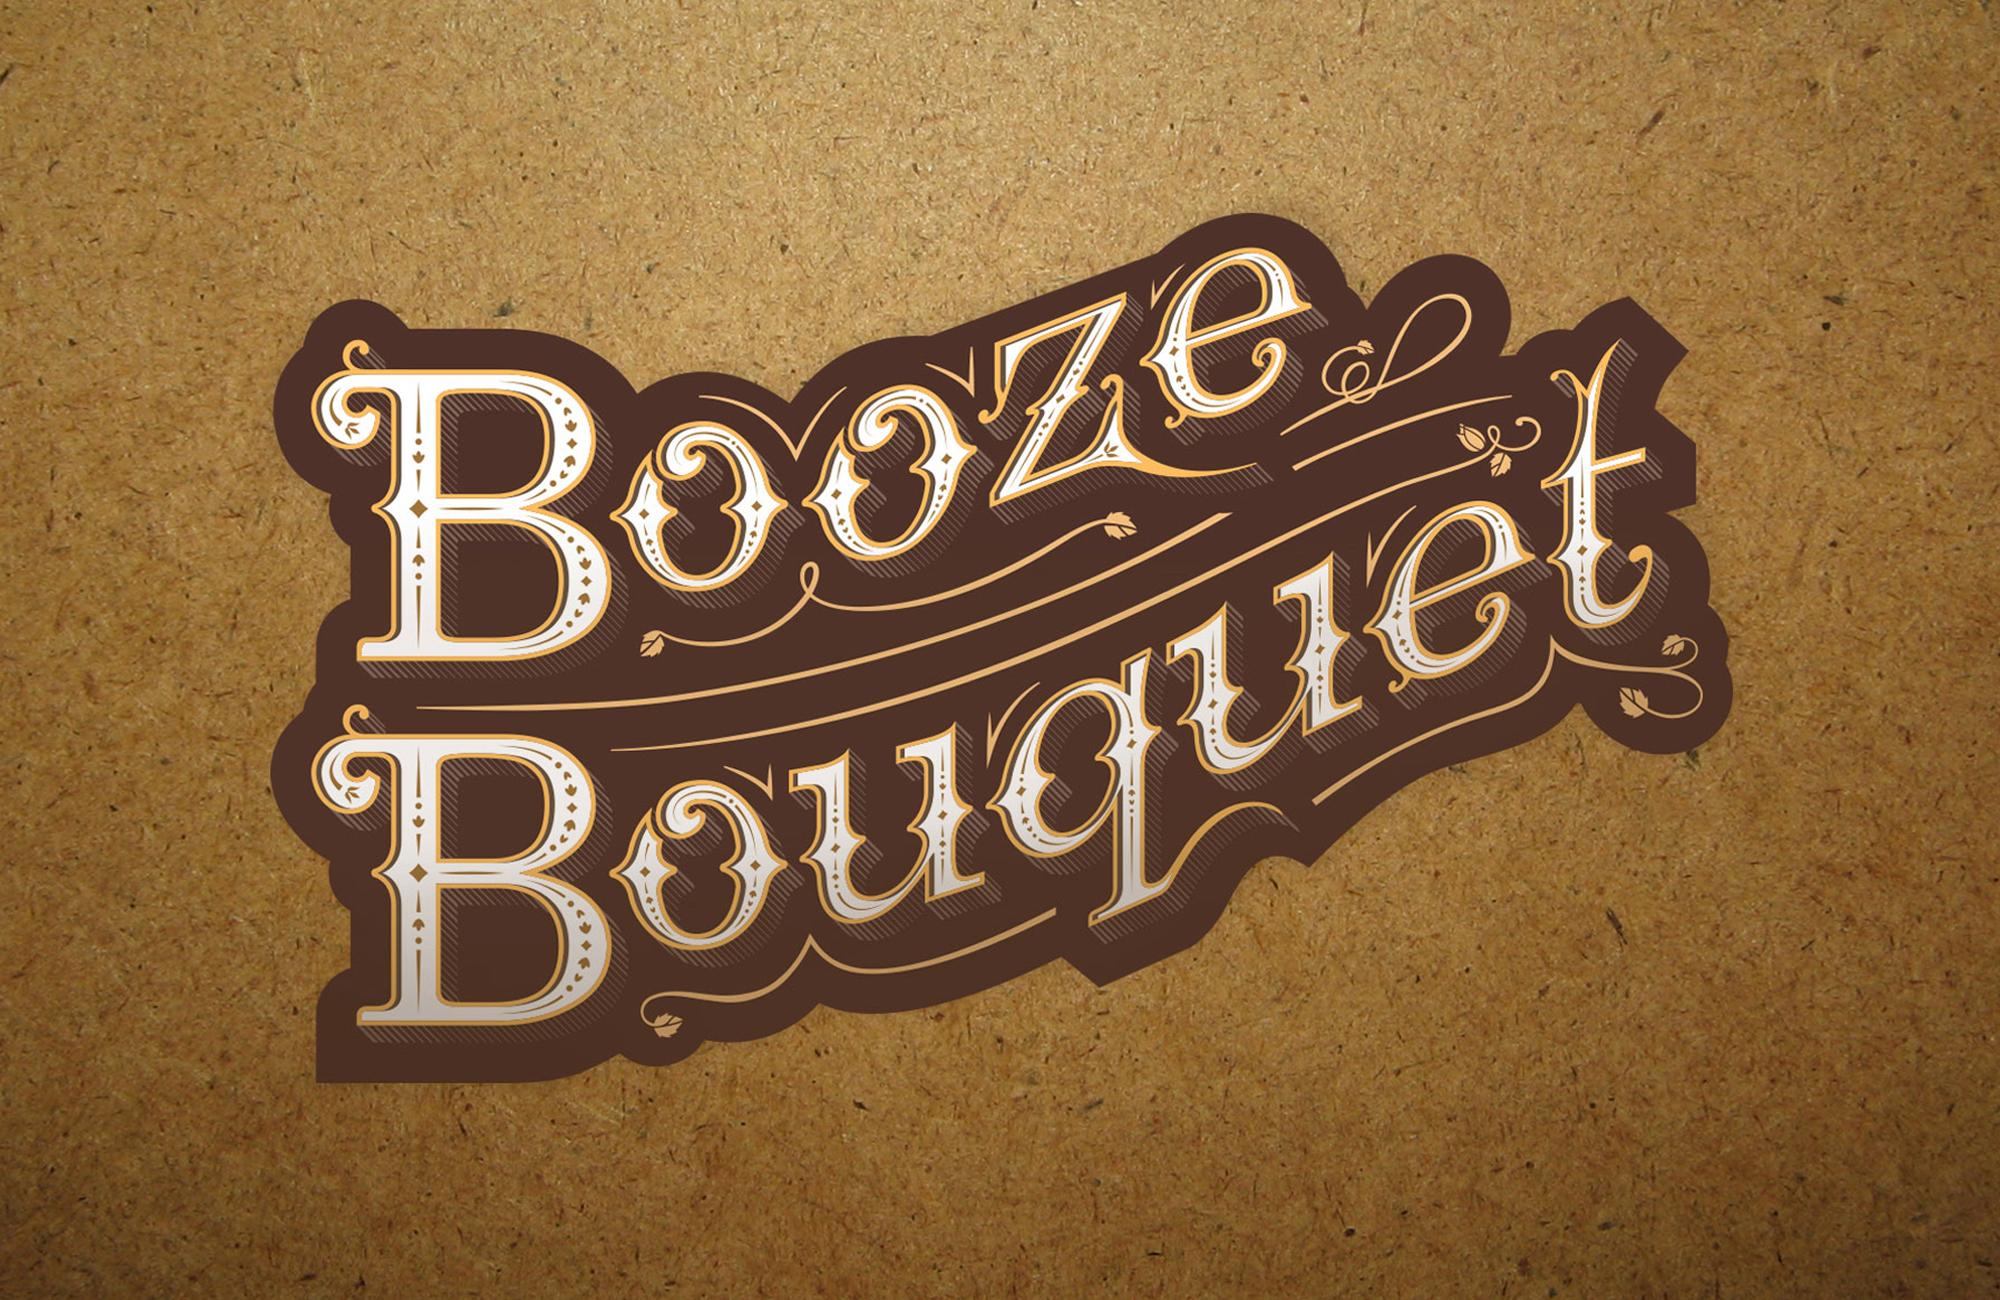 BoozeBouquet_Carousel_2.jpg